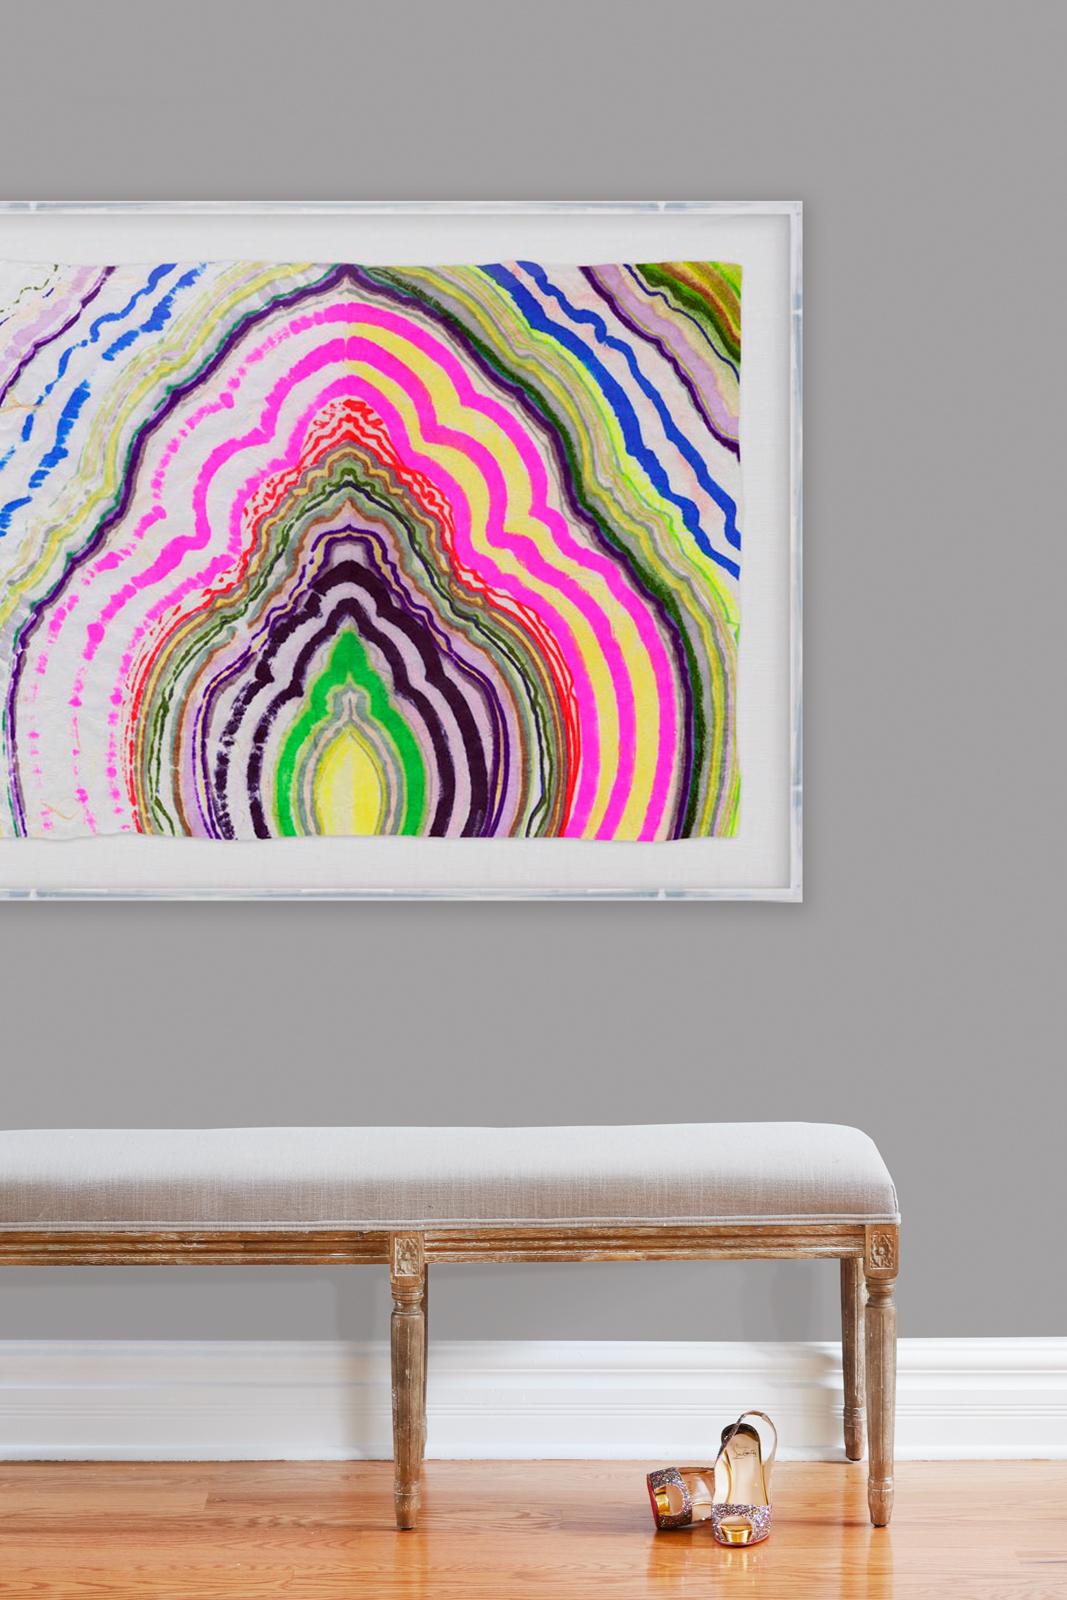 Kristi-Kohut-art-homes-colorful855.jpg